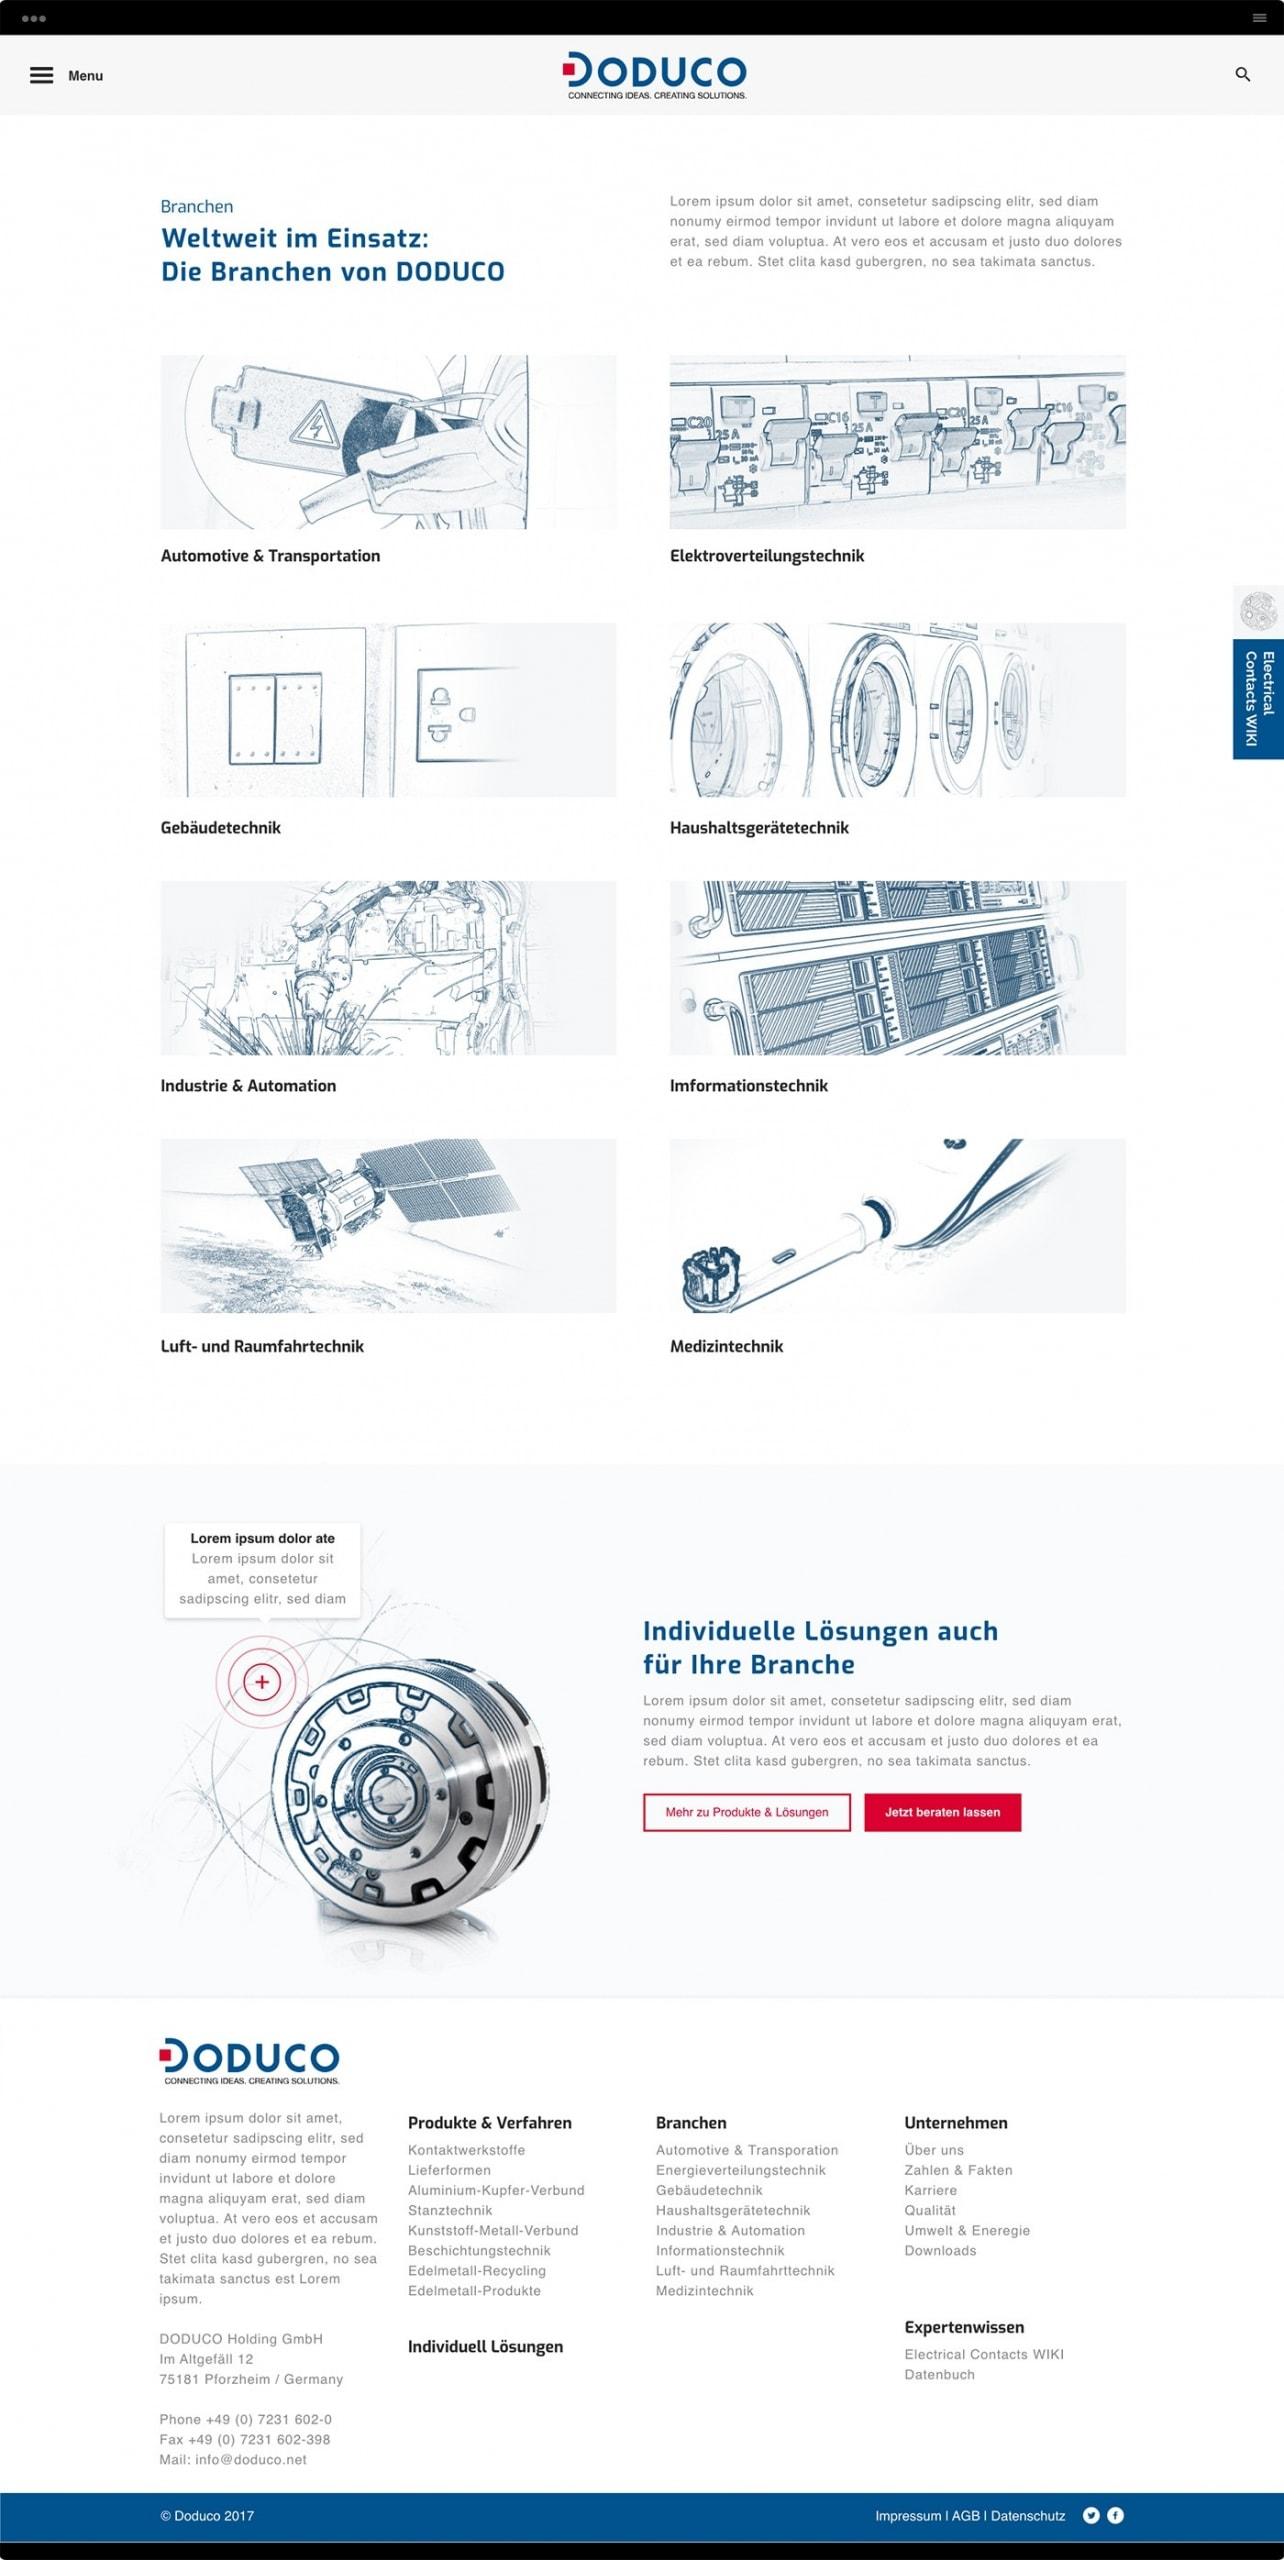 browser doduco 2 scaled - Bärenstark - Digitale Lösungen